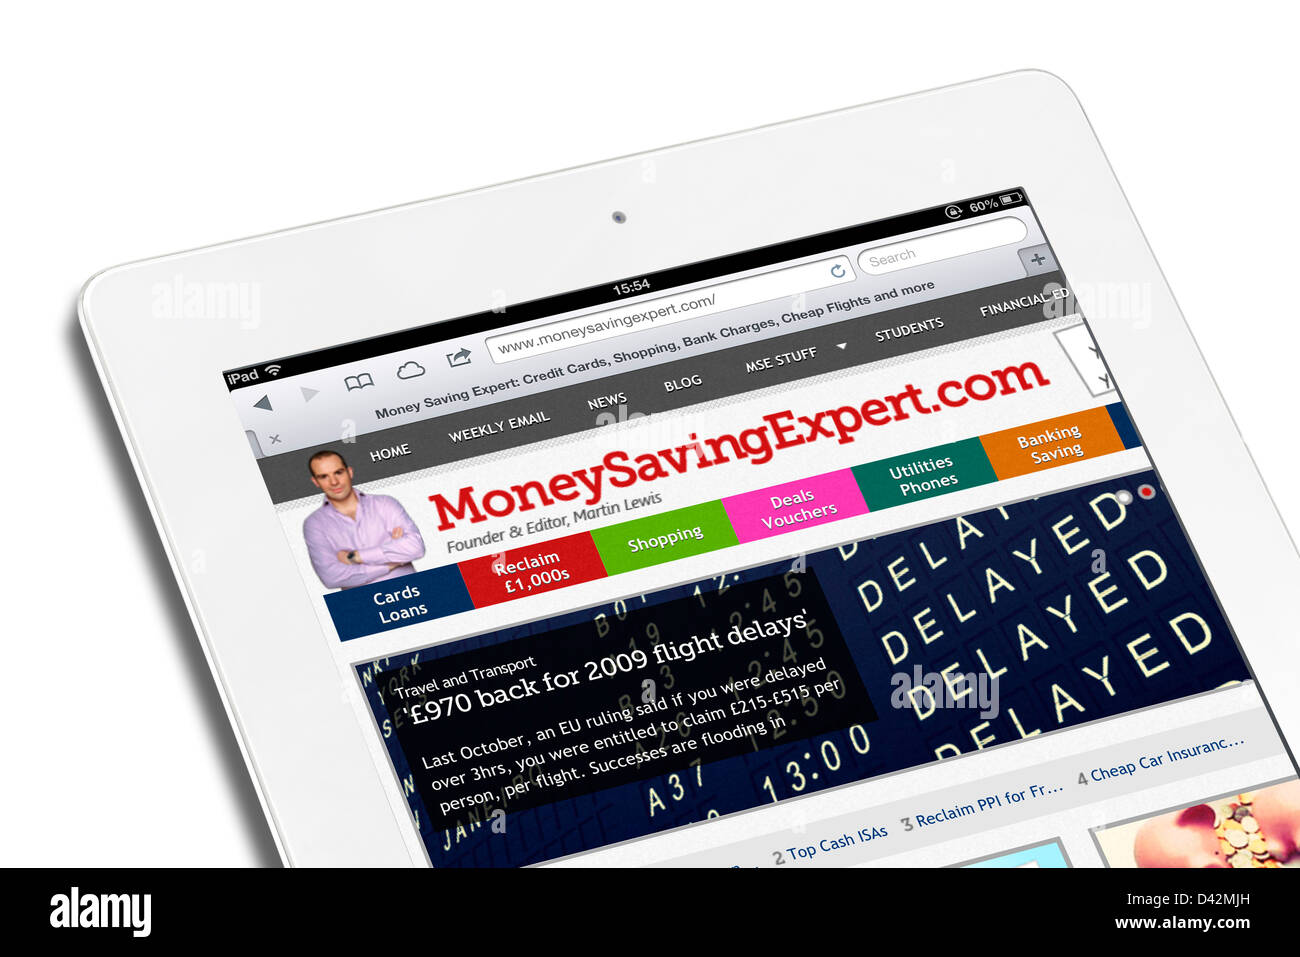 The personal finance site MoneySavingExpert.com viewed on an iPad 4, UK - Stock Image